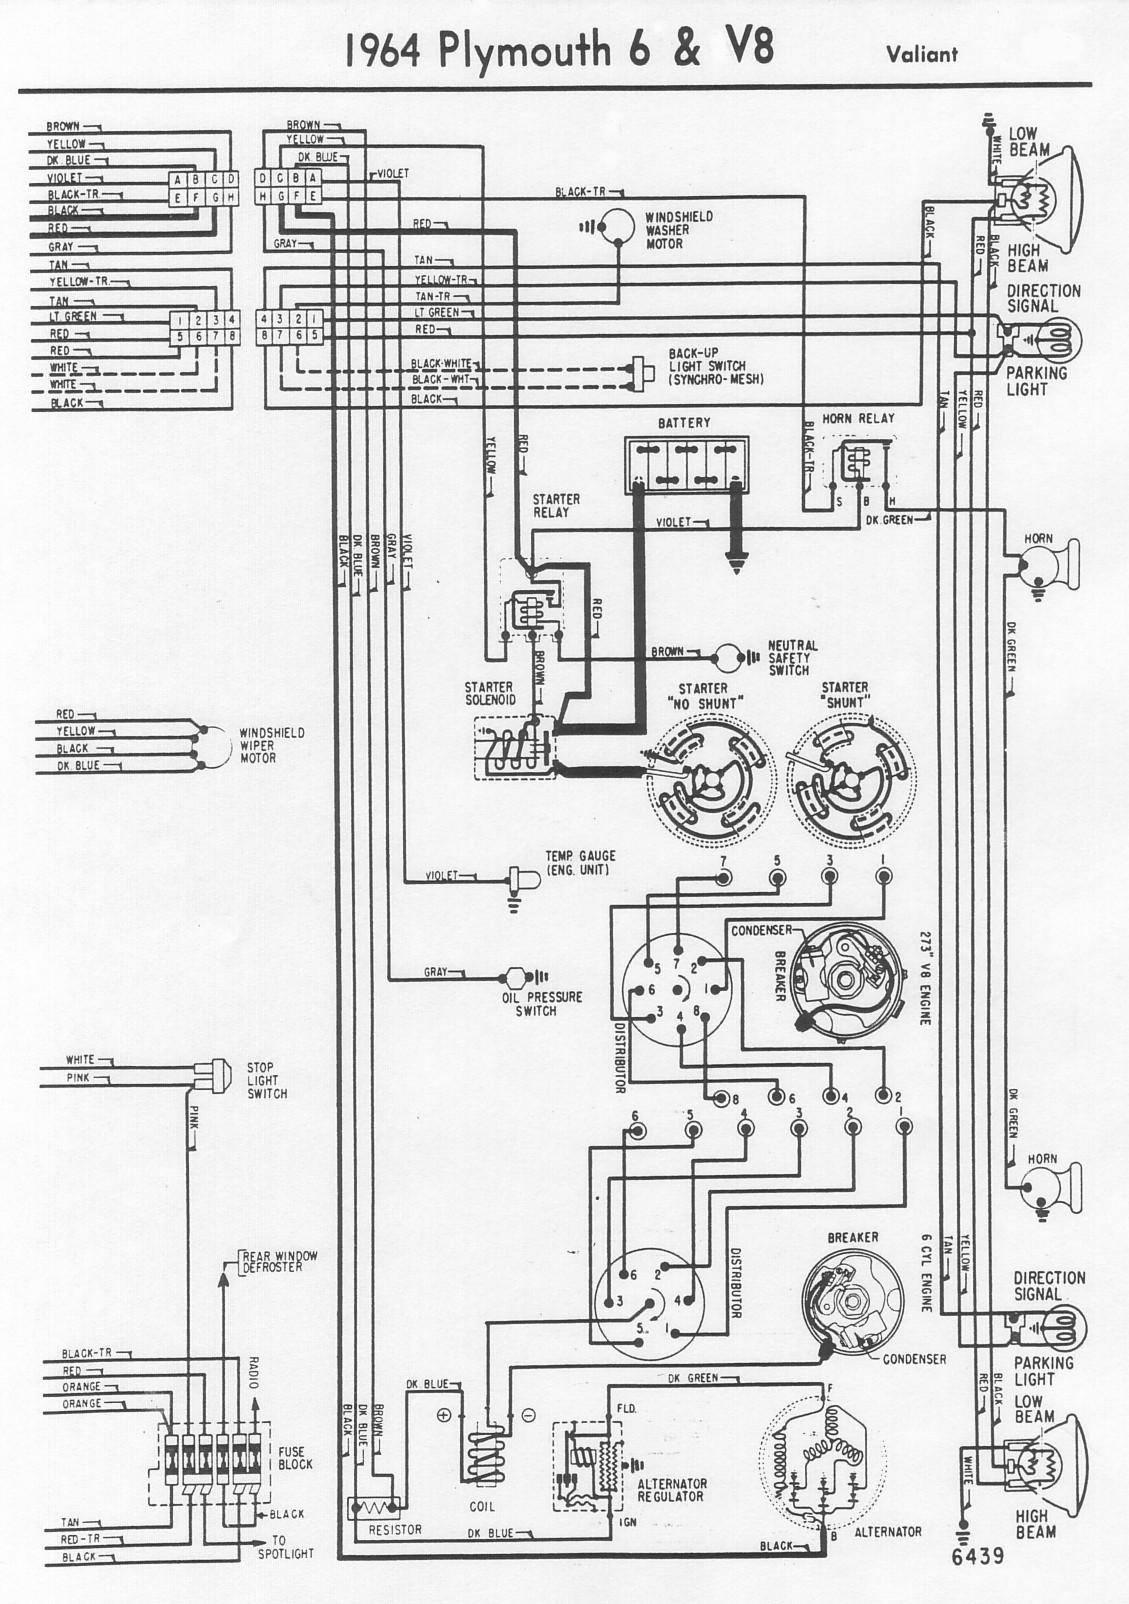 Early Ford Alternator Wiring Diagram